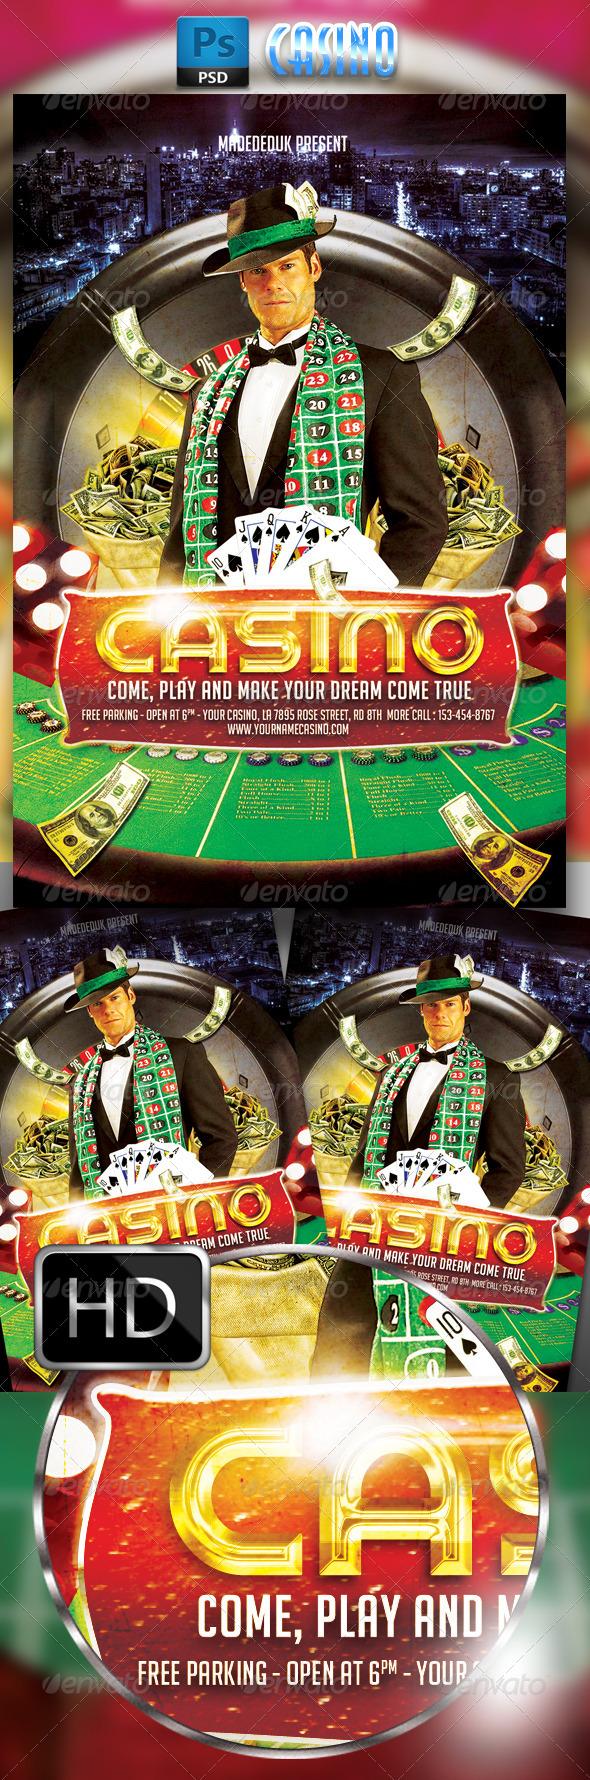 Casino Flyer Template #2